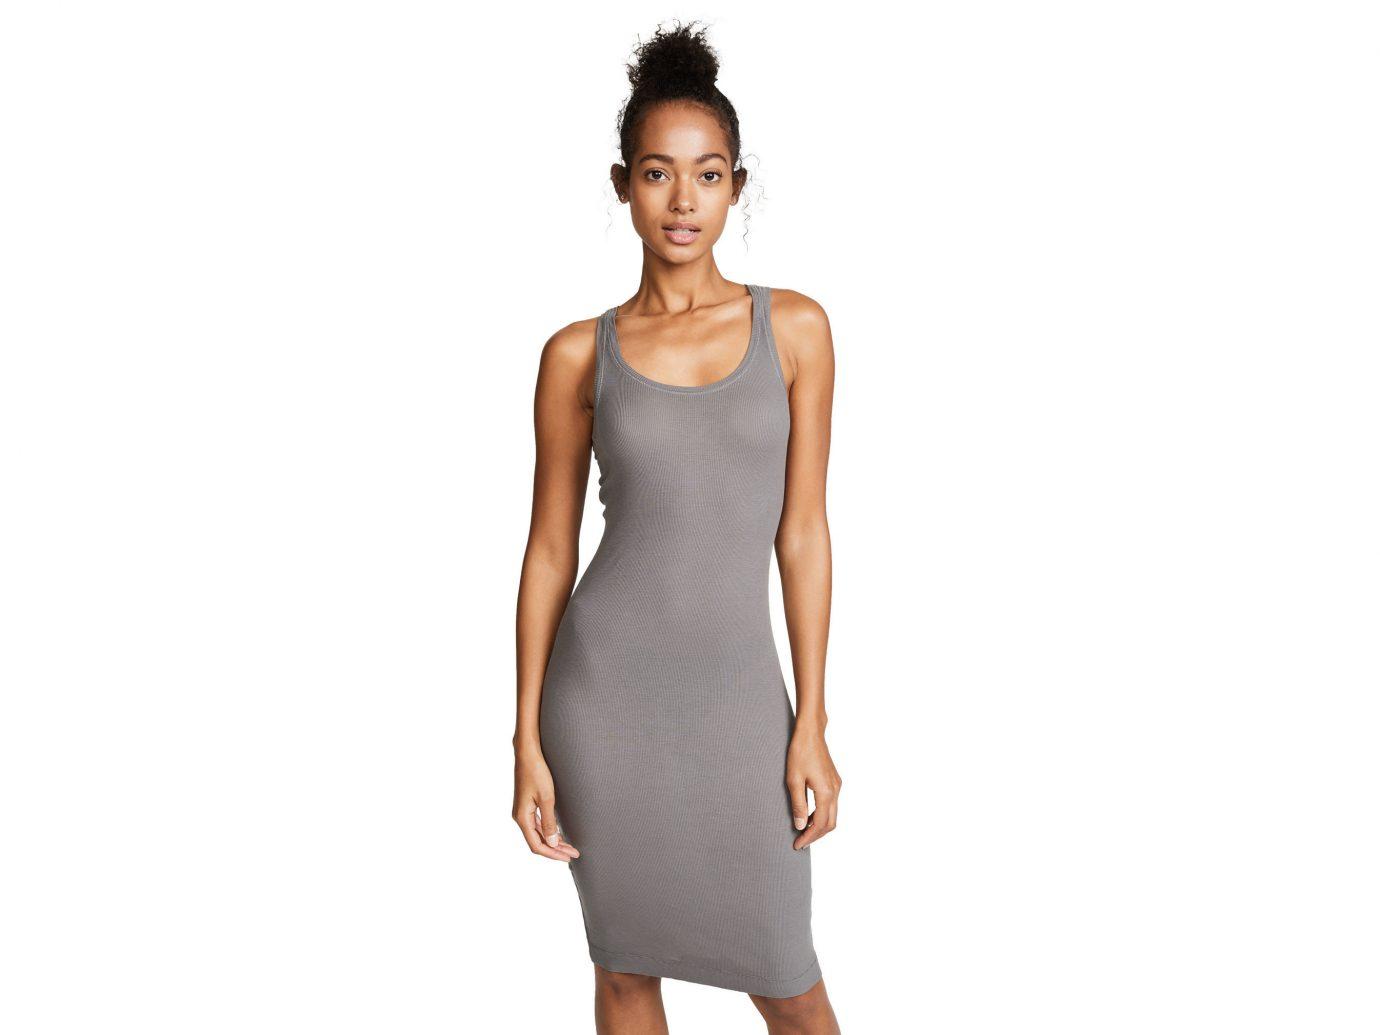 Celebs Style + Design Travel Shop clothing person dress day dress shoulder neck fashion model arm cocktail dress posing joint little black dress sleeve